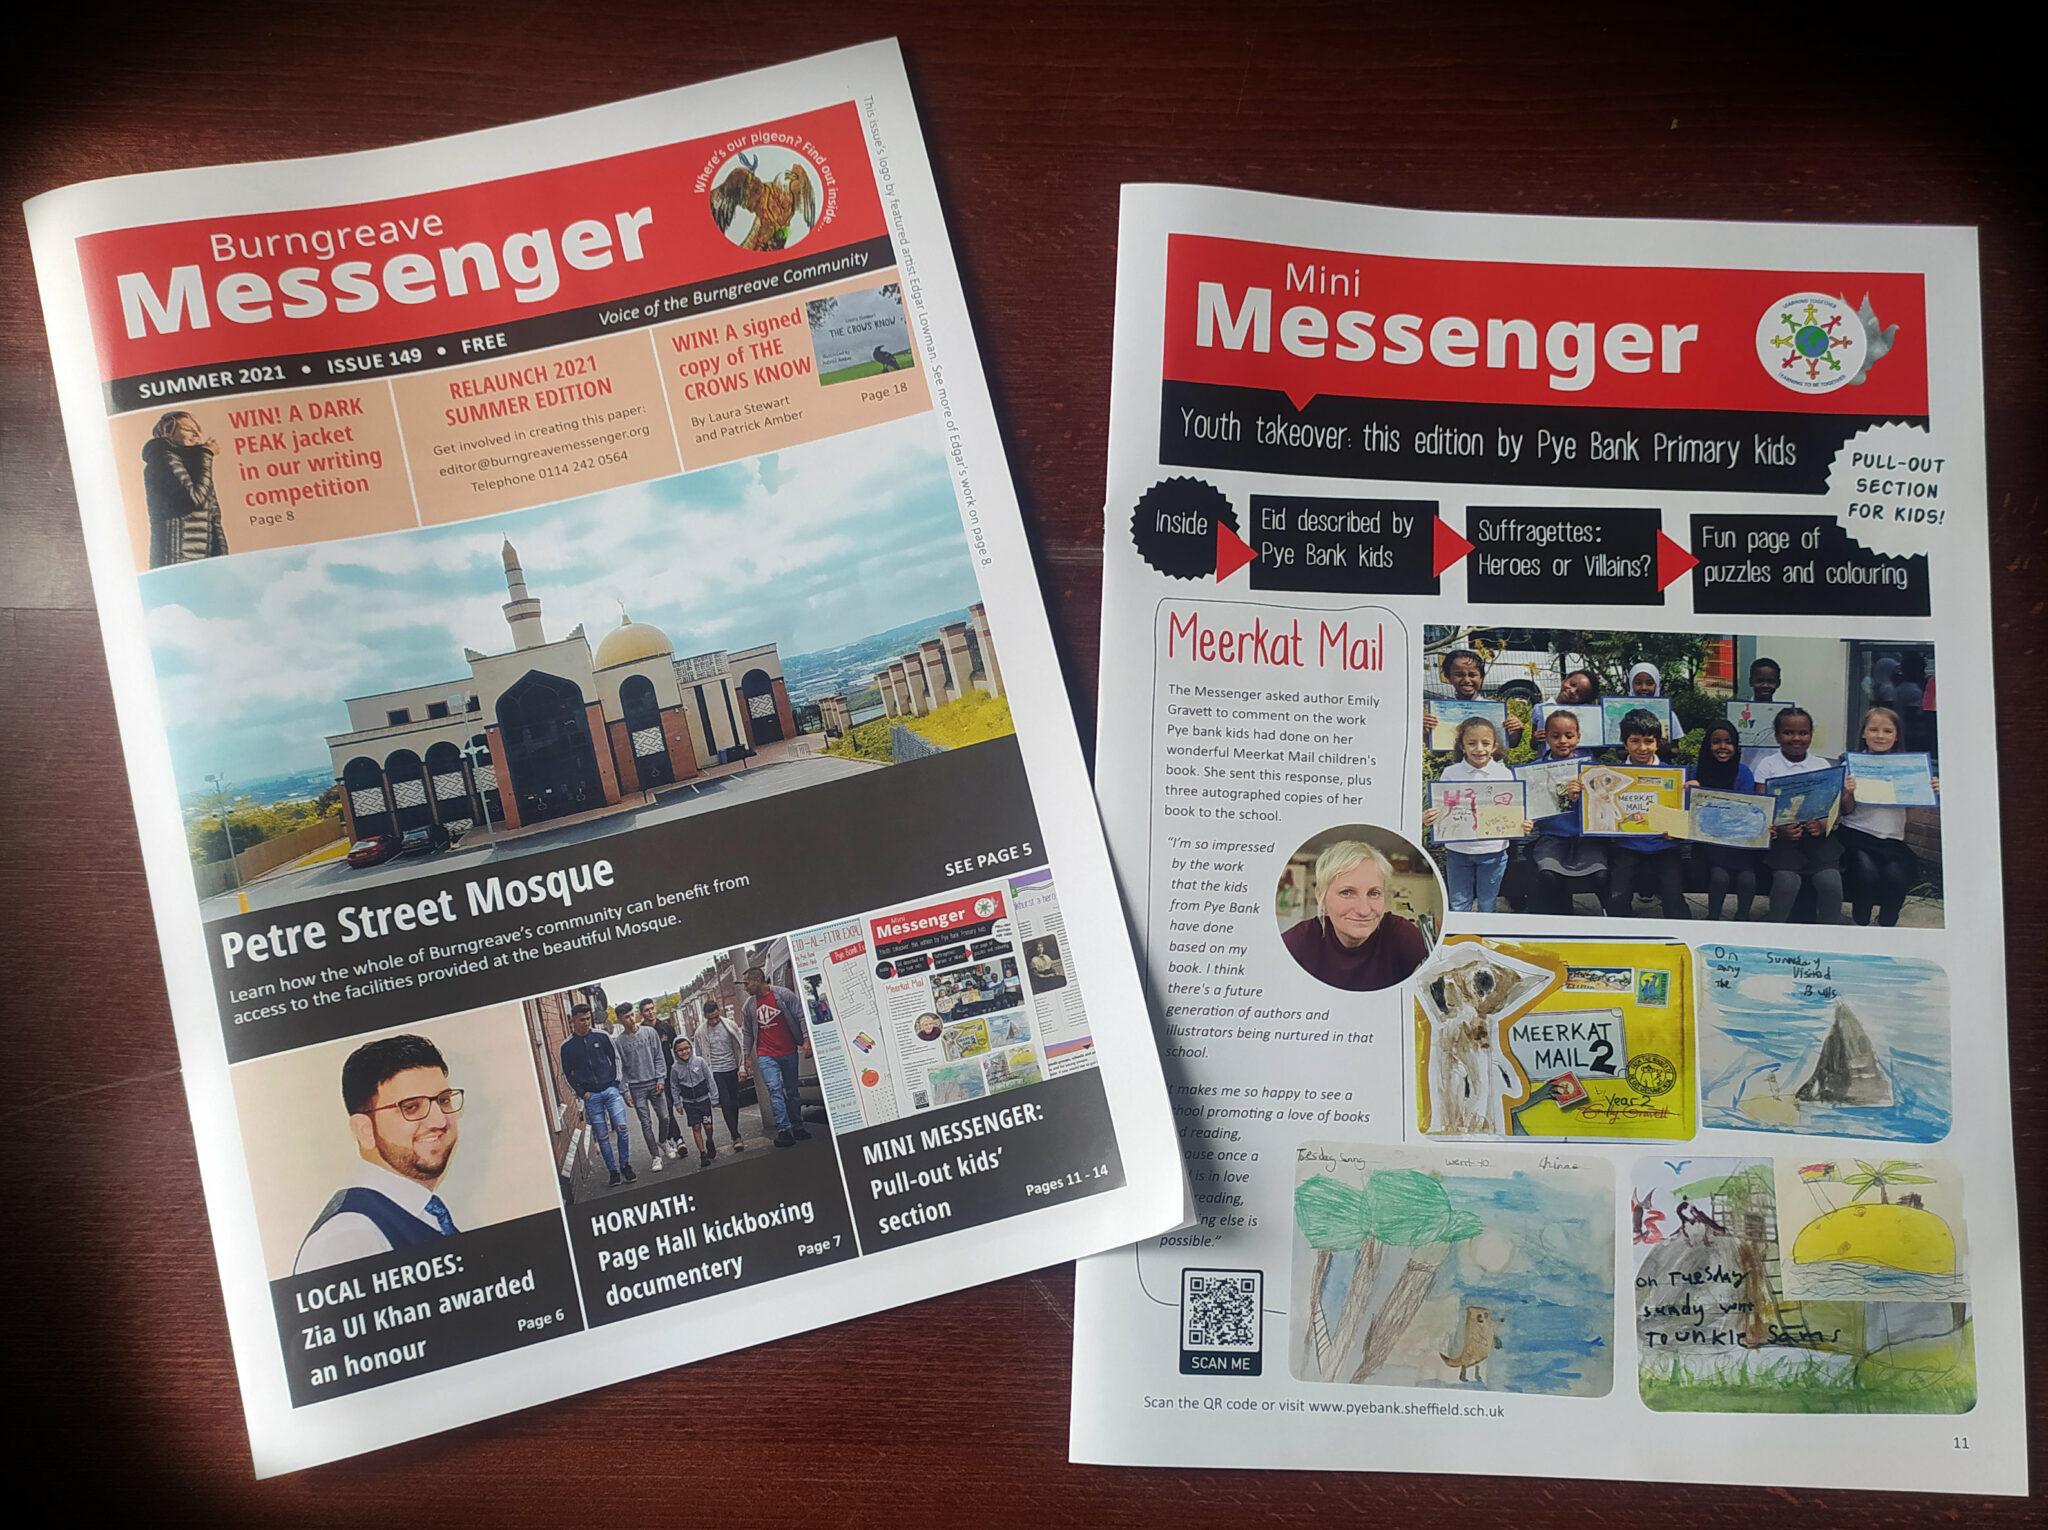 Burngreave Messenger Summer 2021 Issue 149